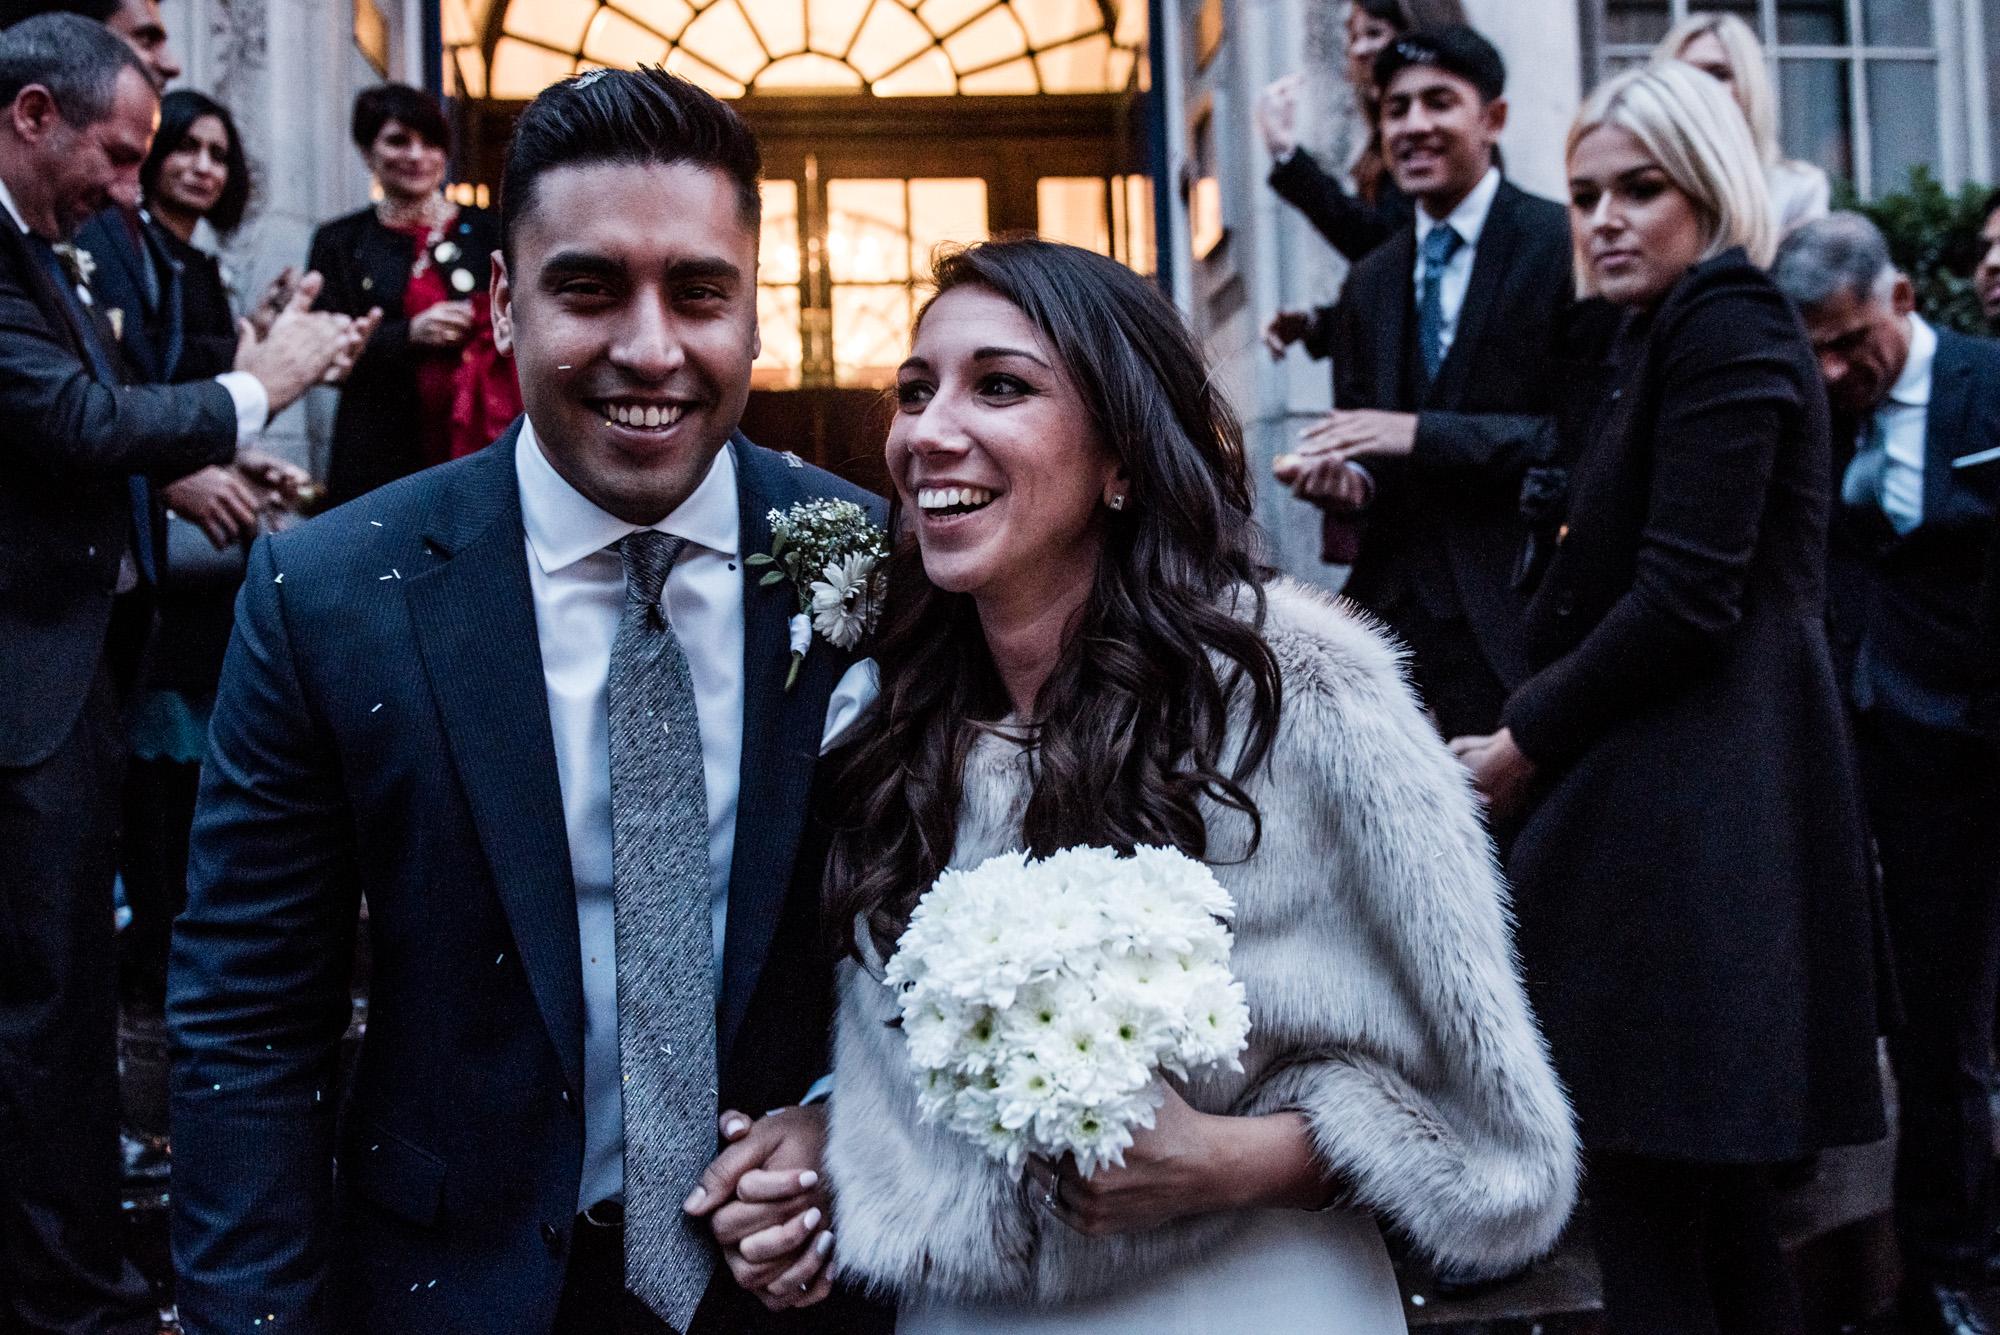 Chelsea Wedding Blog 22.08.18 16.jpg